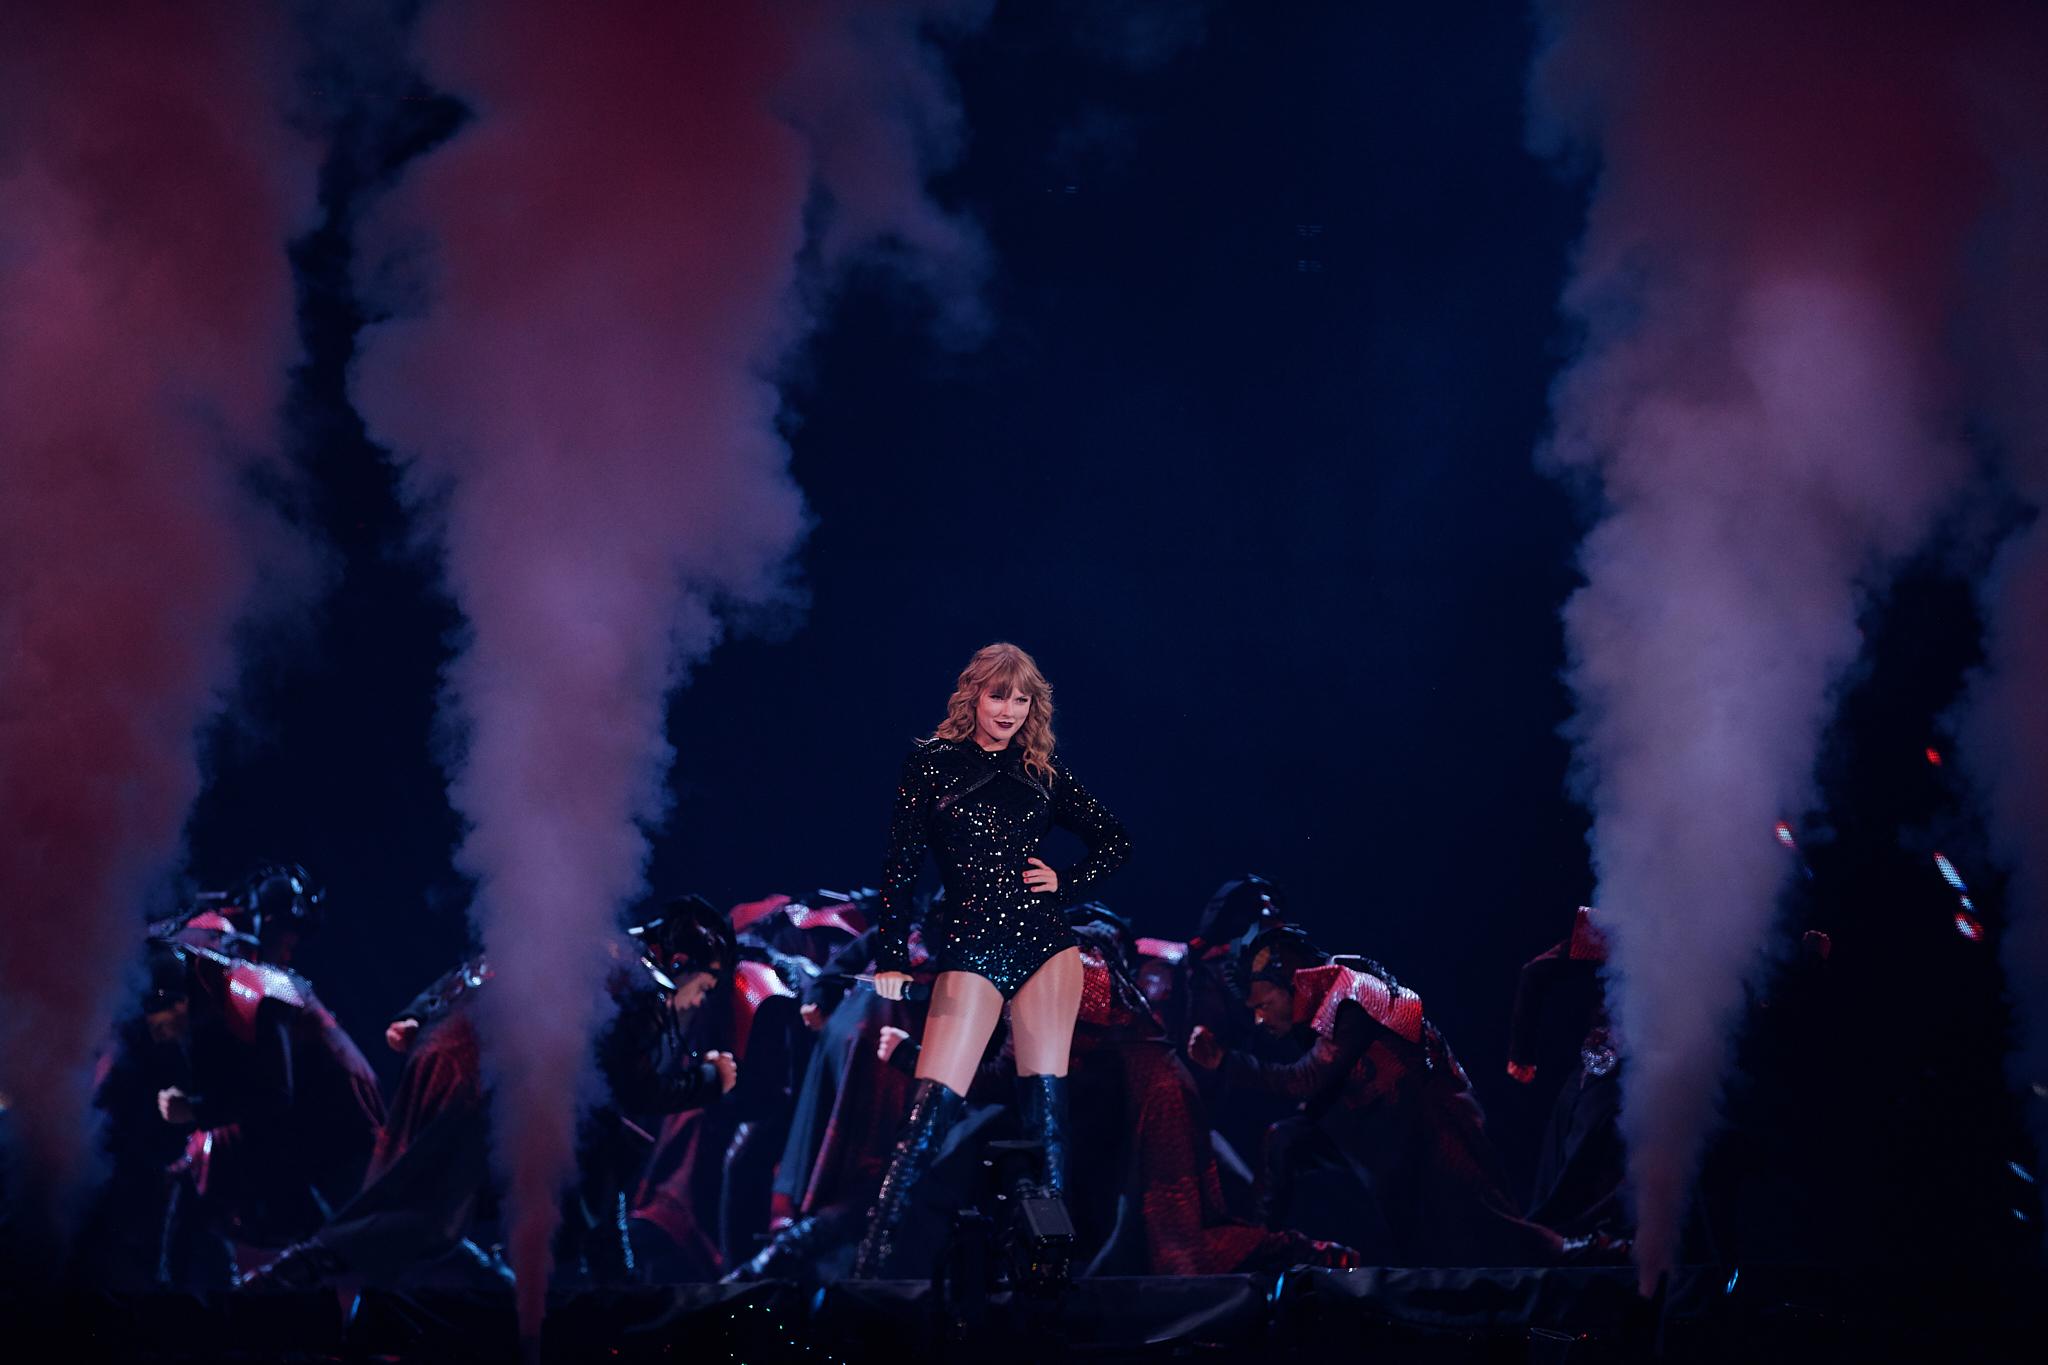 Taylor_Swift_at_US_Bank_Stadium_08-31-2018_Photo_By_Joe_Lemke_020.jpg